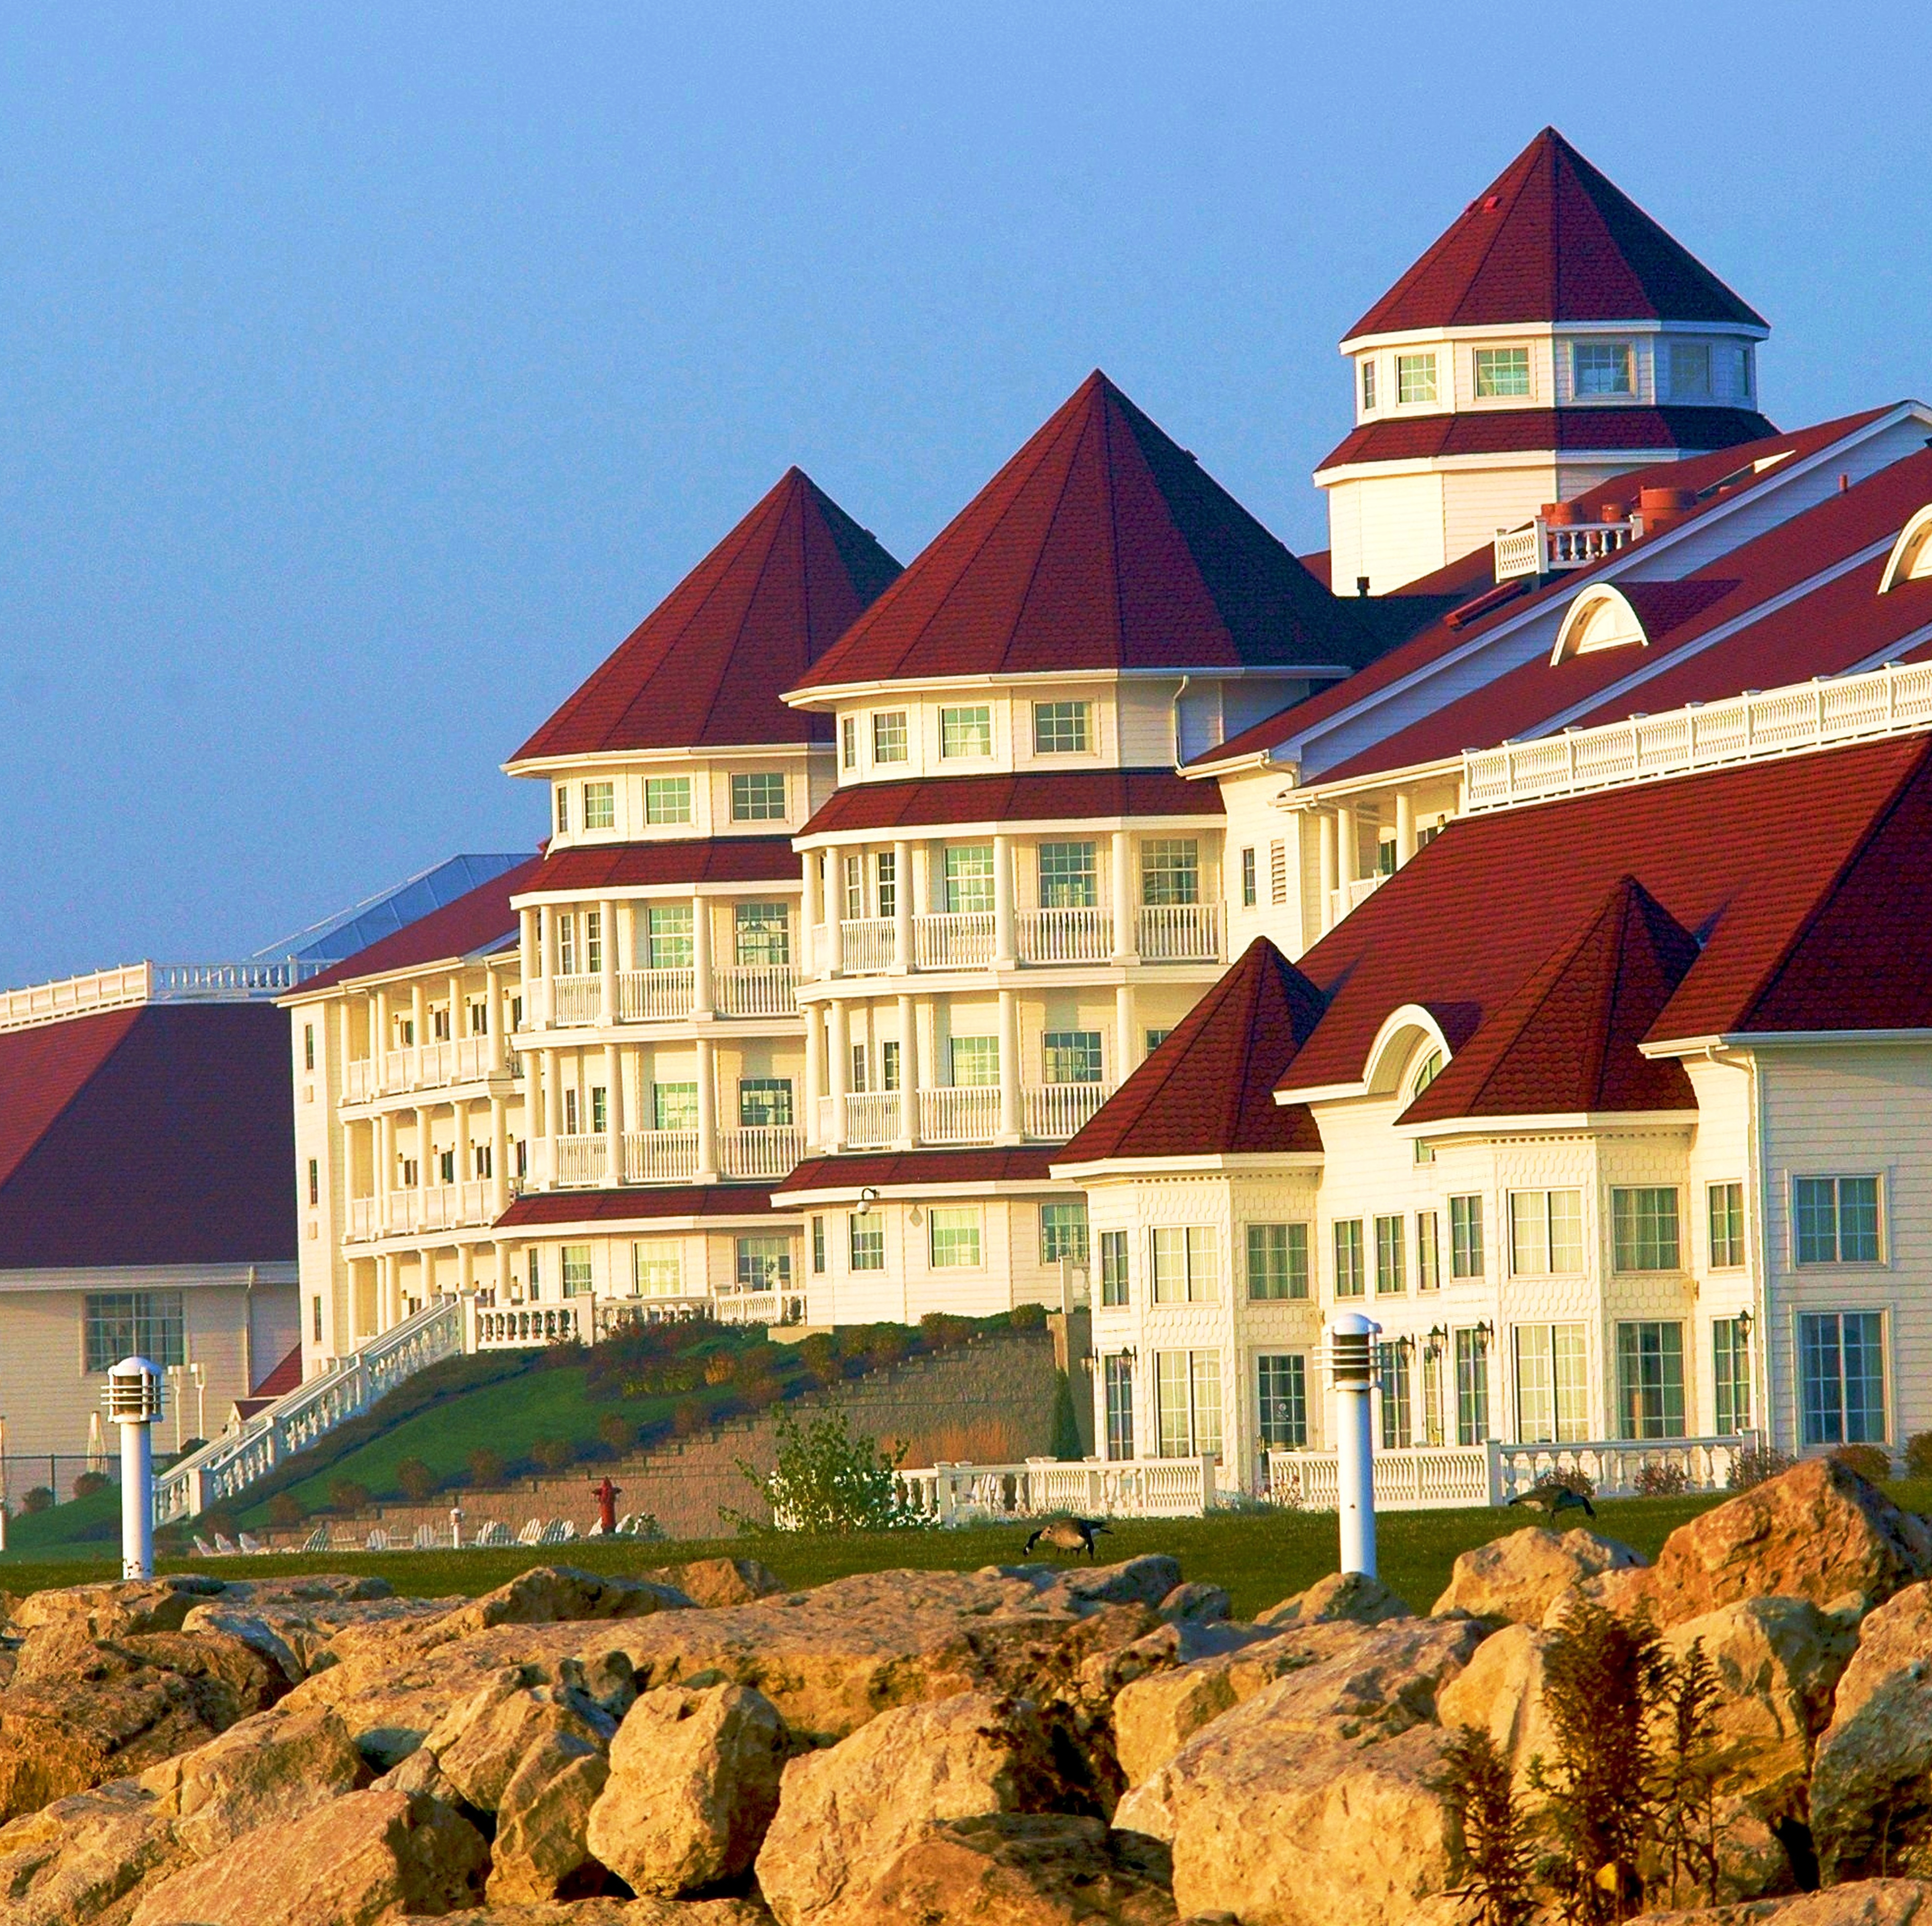 Blue Harbor Resort Sheboygan Wisconsin 20x13 600dpi - Copy